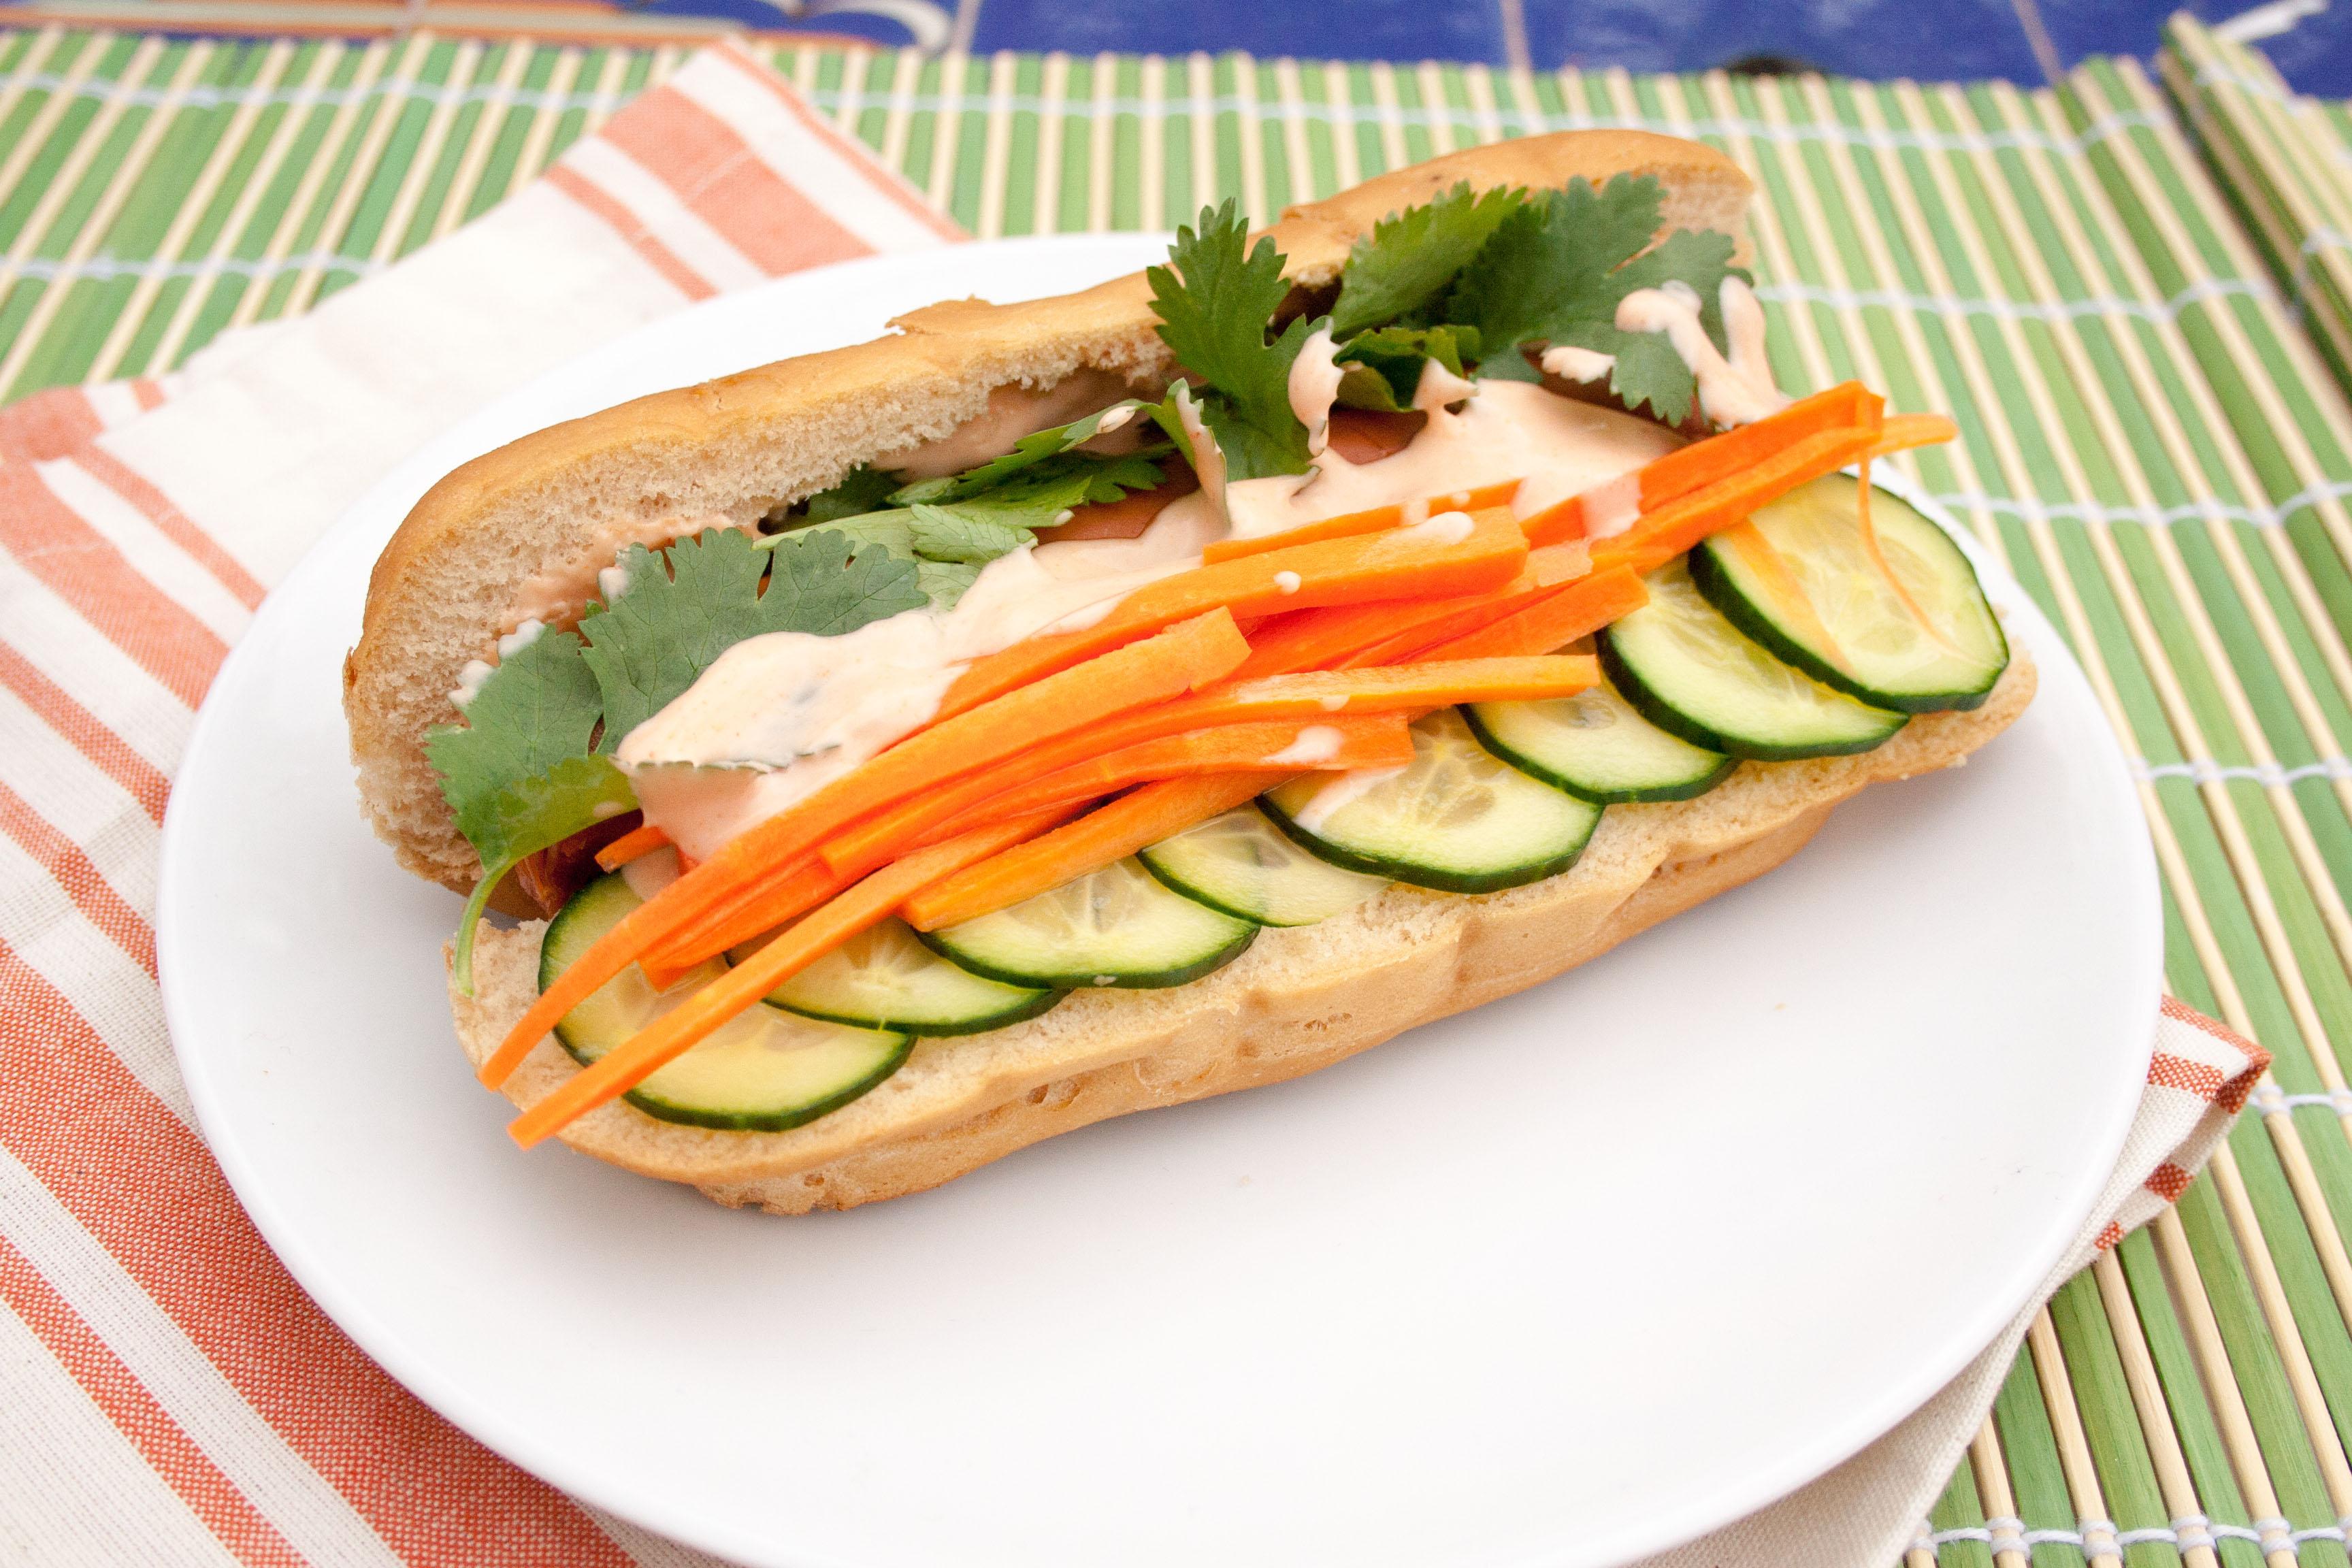 ... kitchen banh mi hot dog tips viet world kitchen banh mi hot dog